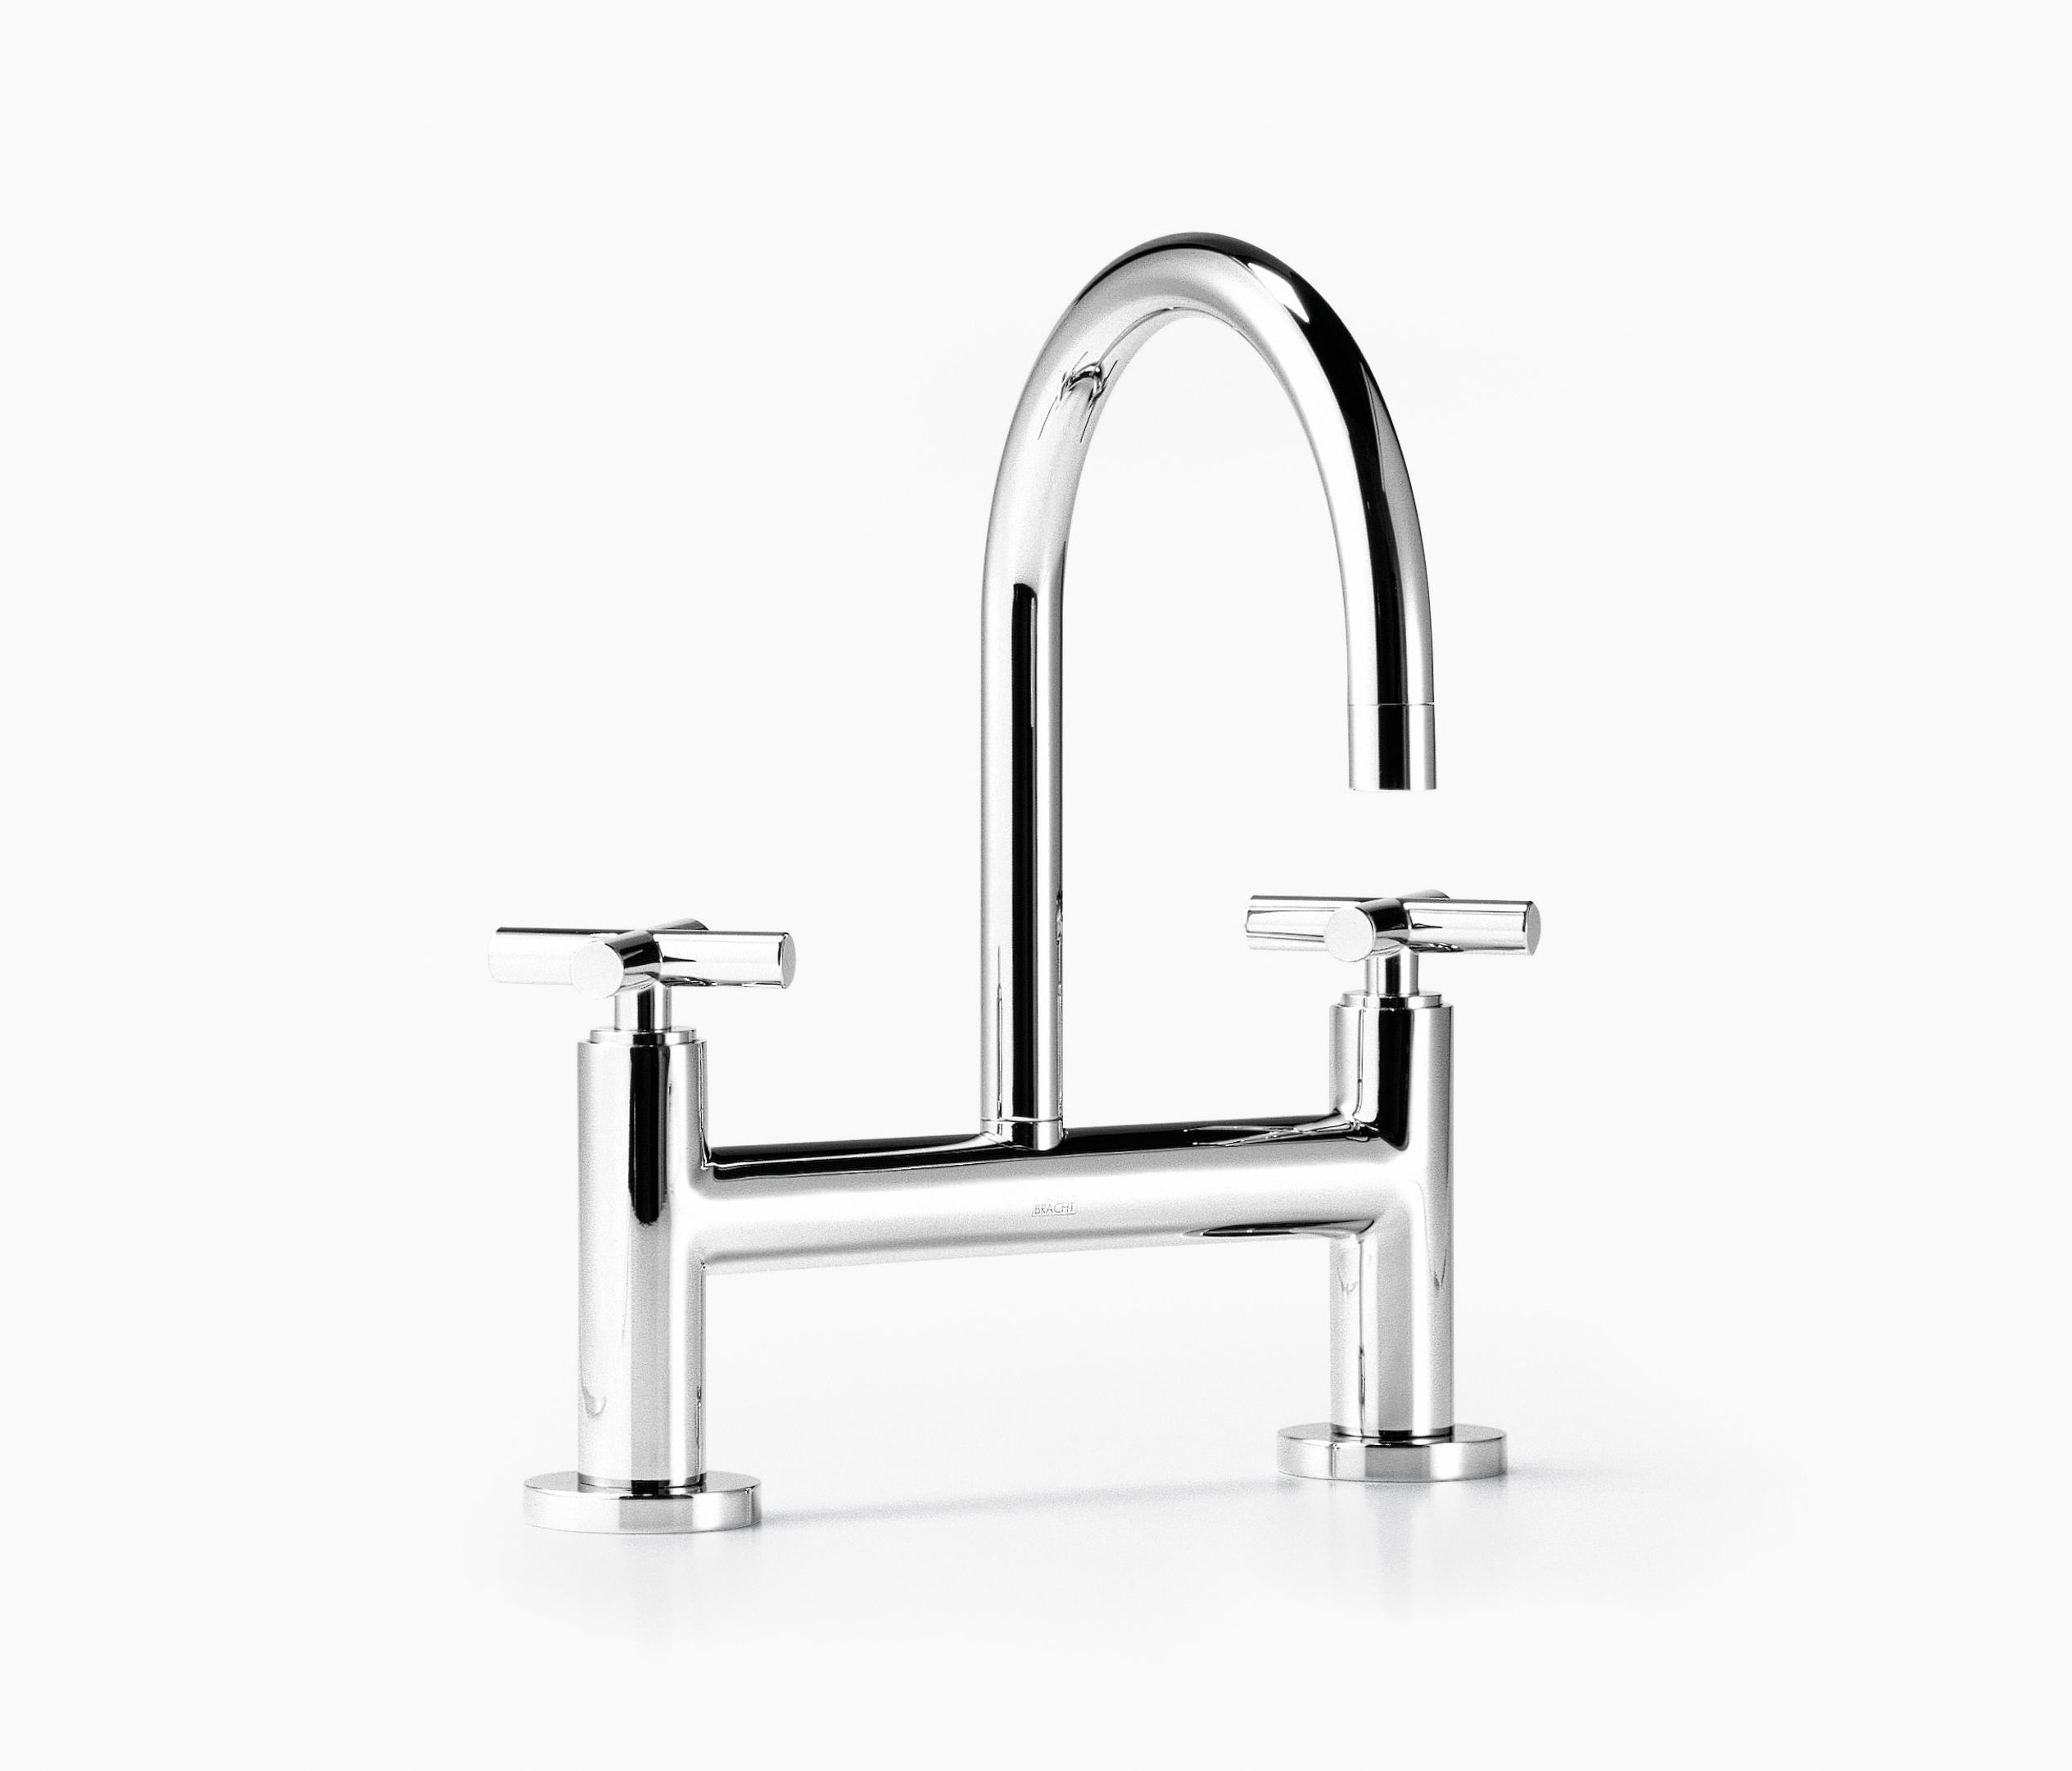 tara bater a puente para lavabo grifer a para lavabos de dornbracht architonic. Black Bedroom Furniture Sets. Home Design Ideas